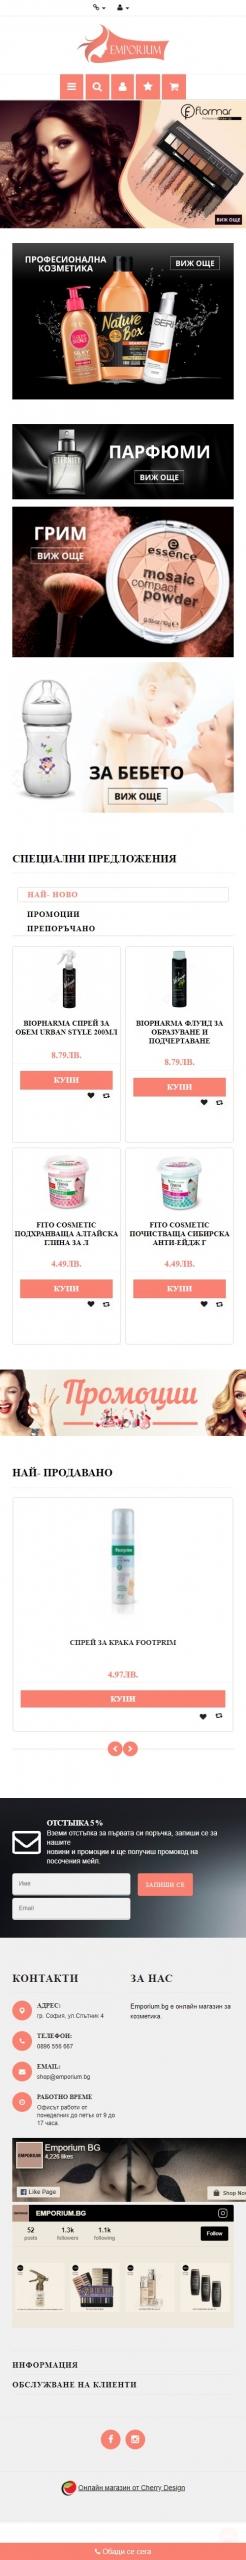 Apps, IzrabotkaNaOnlajnMagazin-CherryDesign-ReklamaOnlajn-Mobile